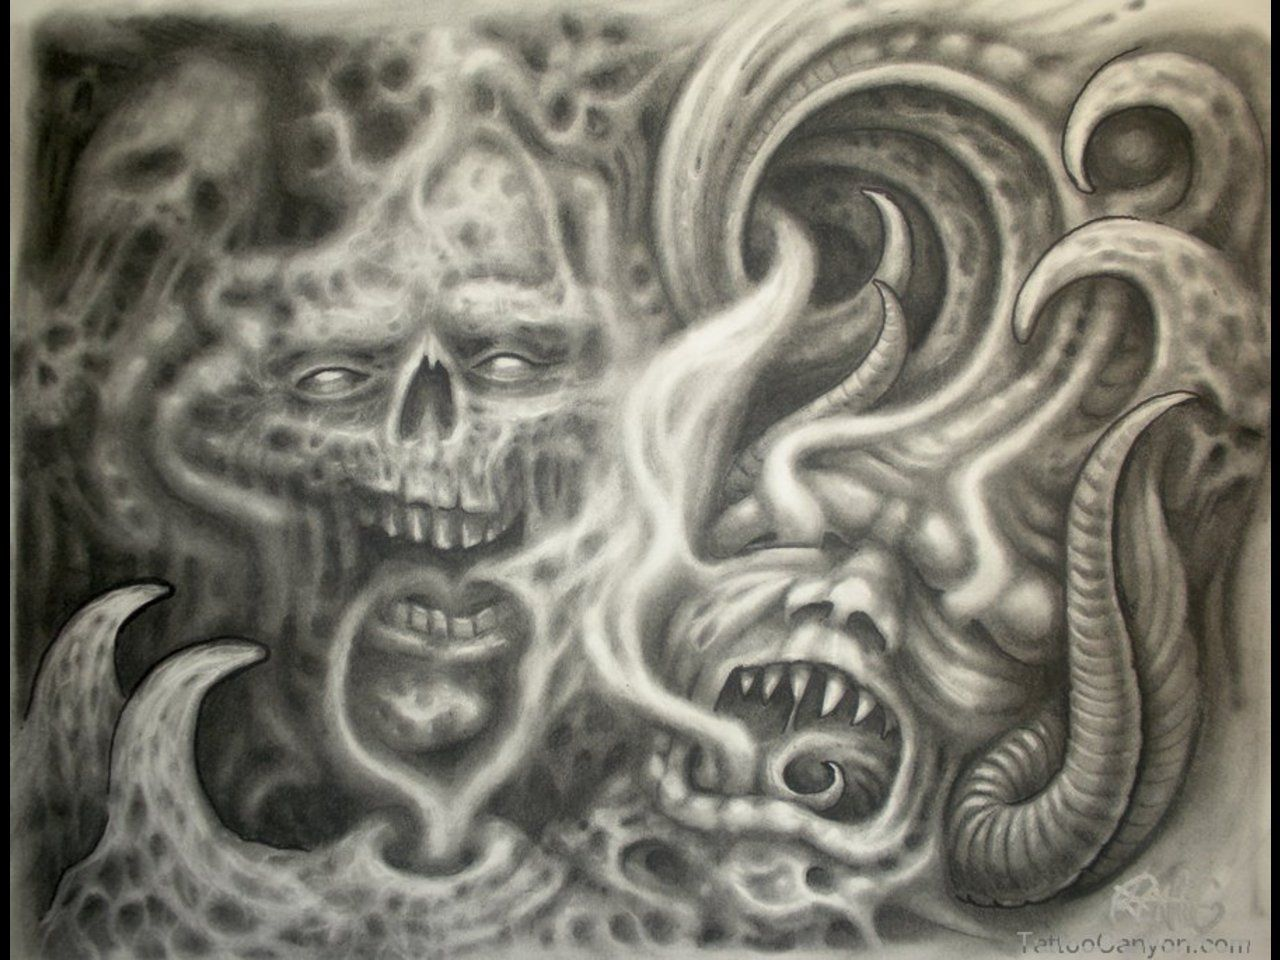 Skulls Demons And Smoke Free Download Tattoo 16952 Picture 10956 Tattoo Sleeve Filler Demon Tattoo Tattoo Background